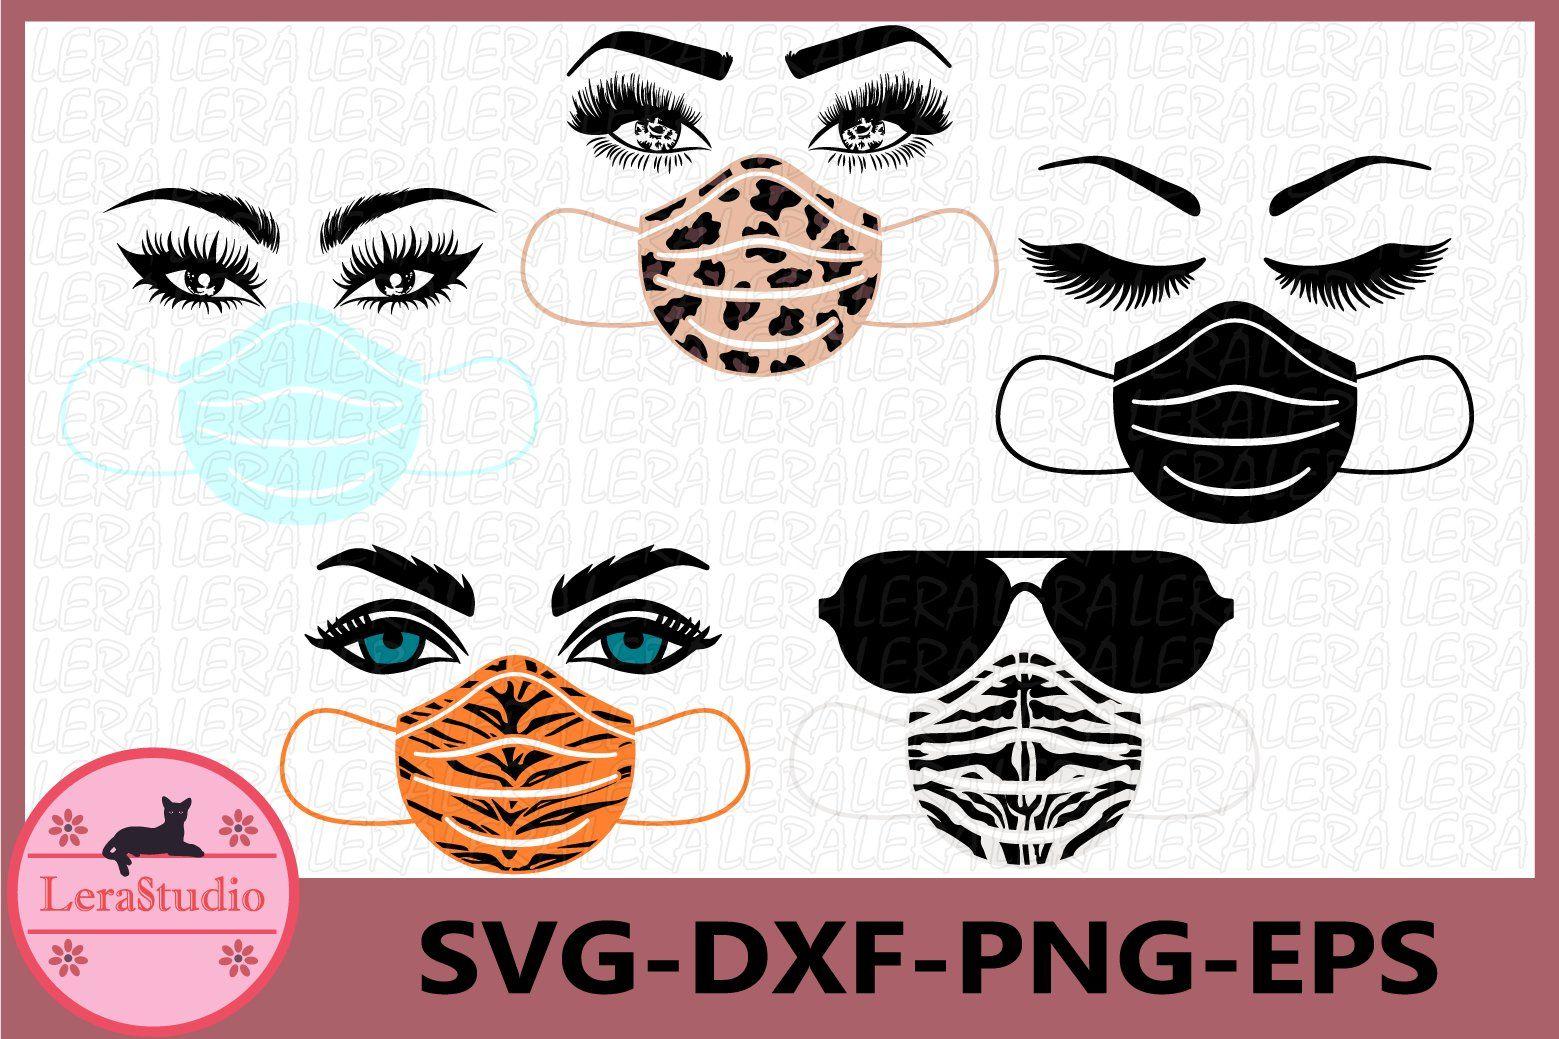 Face Mask Svg Eyelashes Svg Medical Mask Svg Eyes Svg 541608 Svgs Design Bundles In 2020 Medical Masks Design Bundles Eyelashes